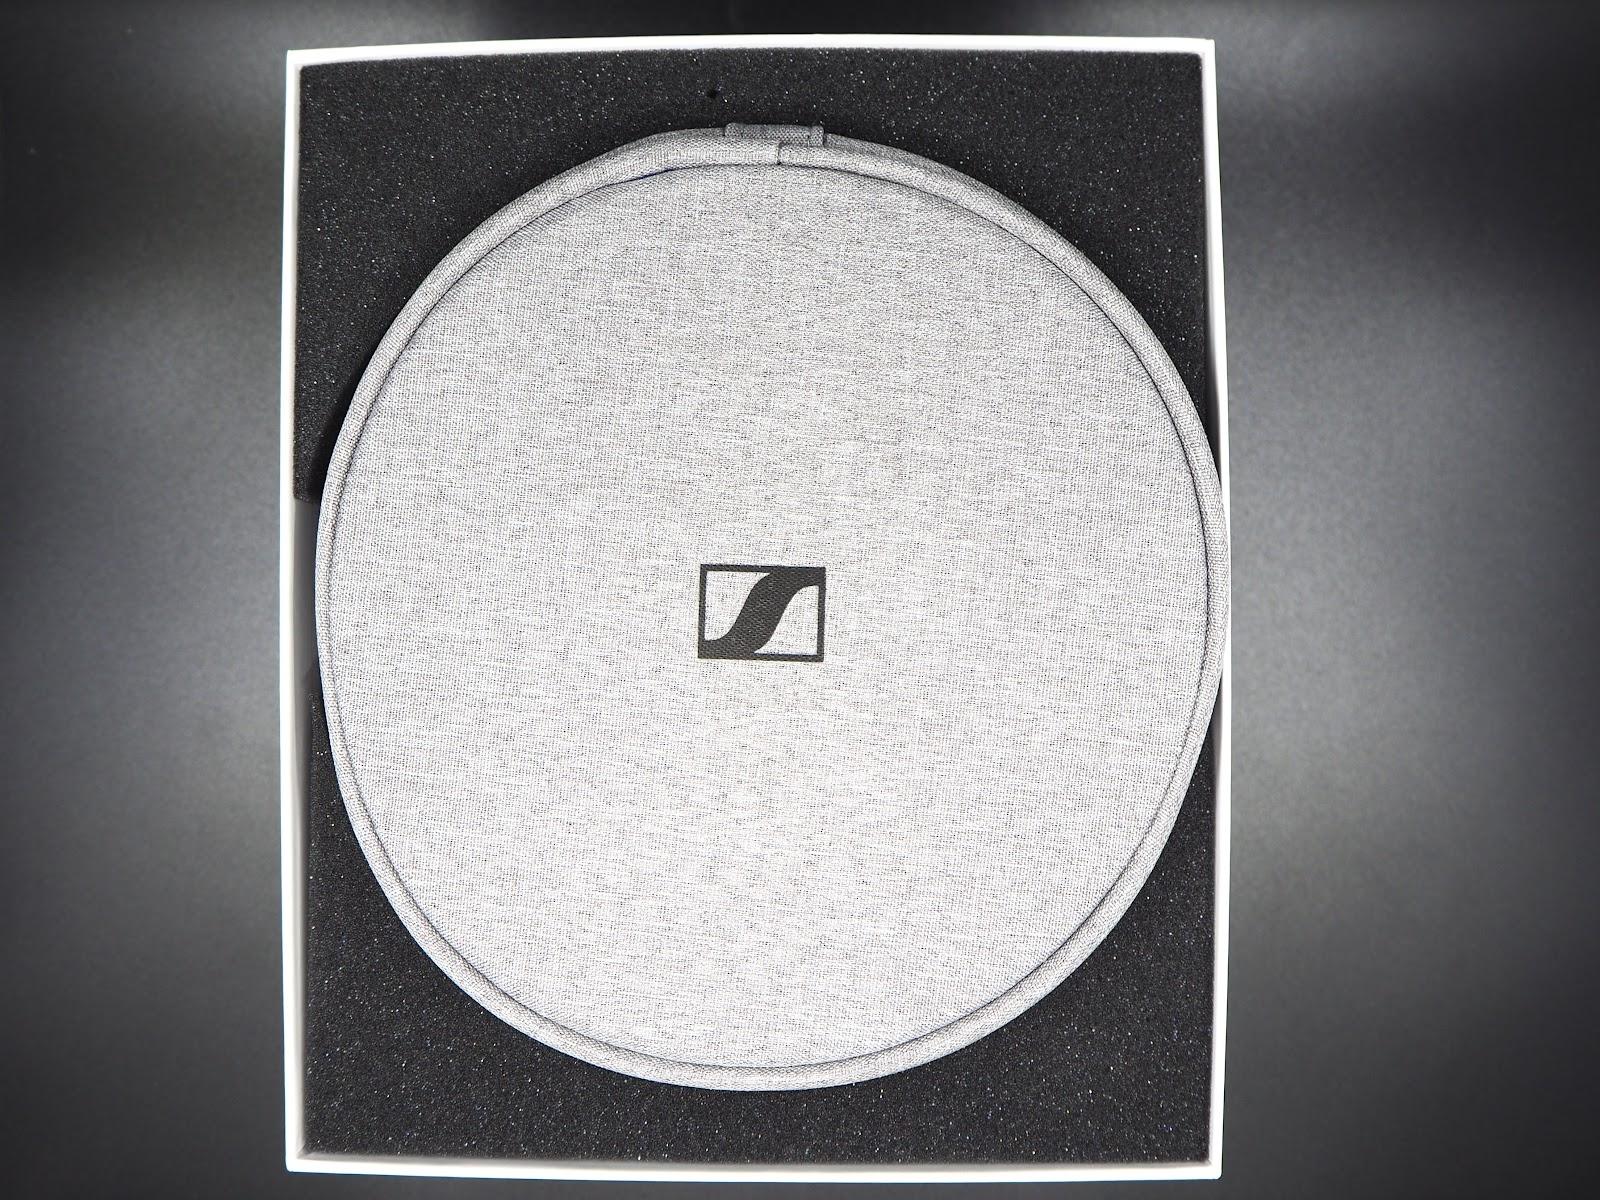 The soft storage case with Sennheiser MOMENTUM Wireless in it